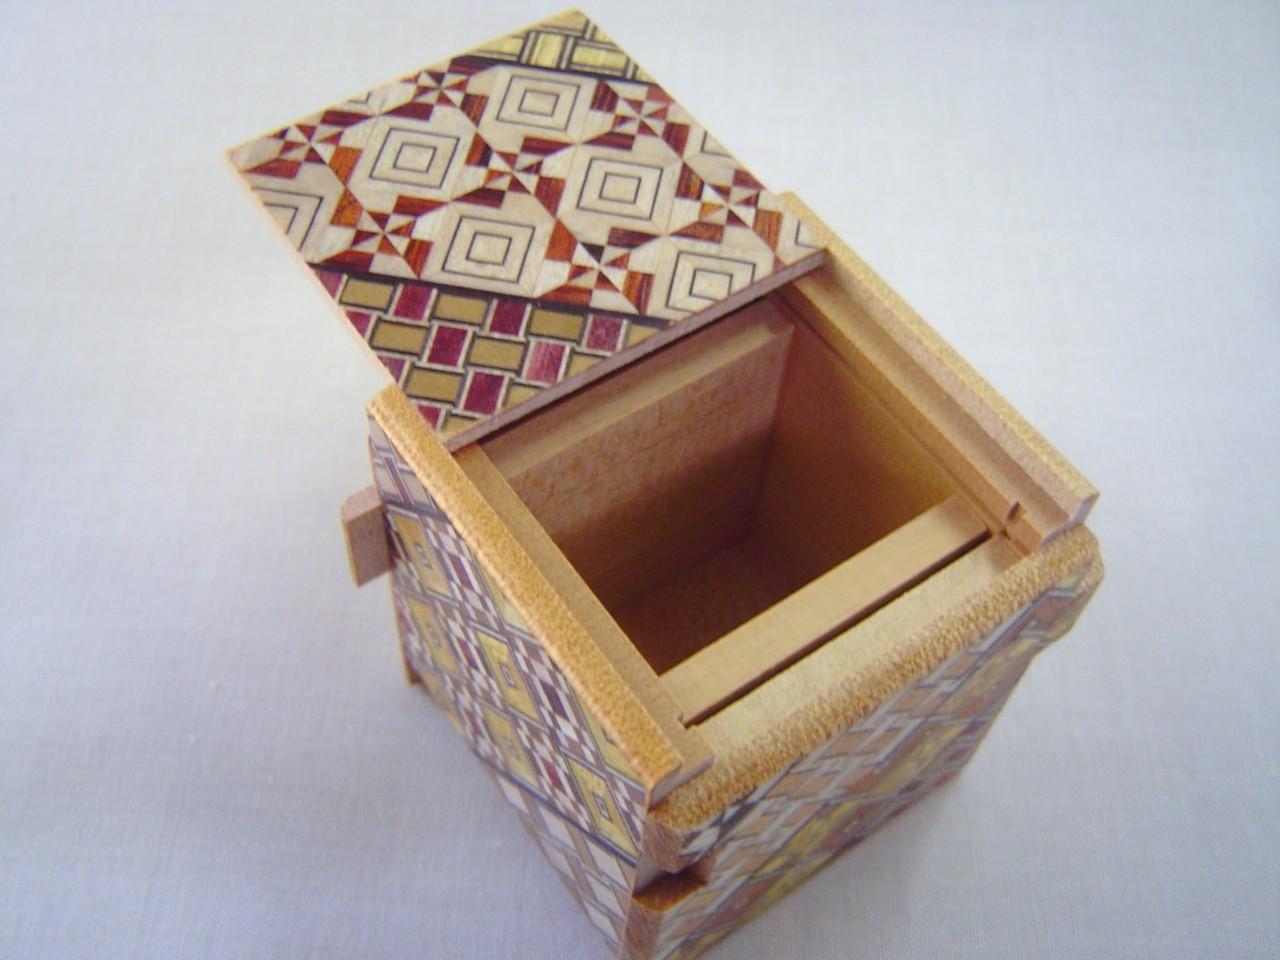 Japan Craft Opening The  Sun Cube  Steps Koyosegi